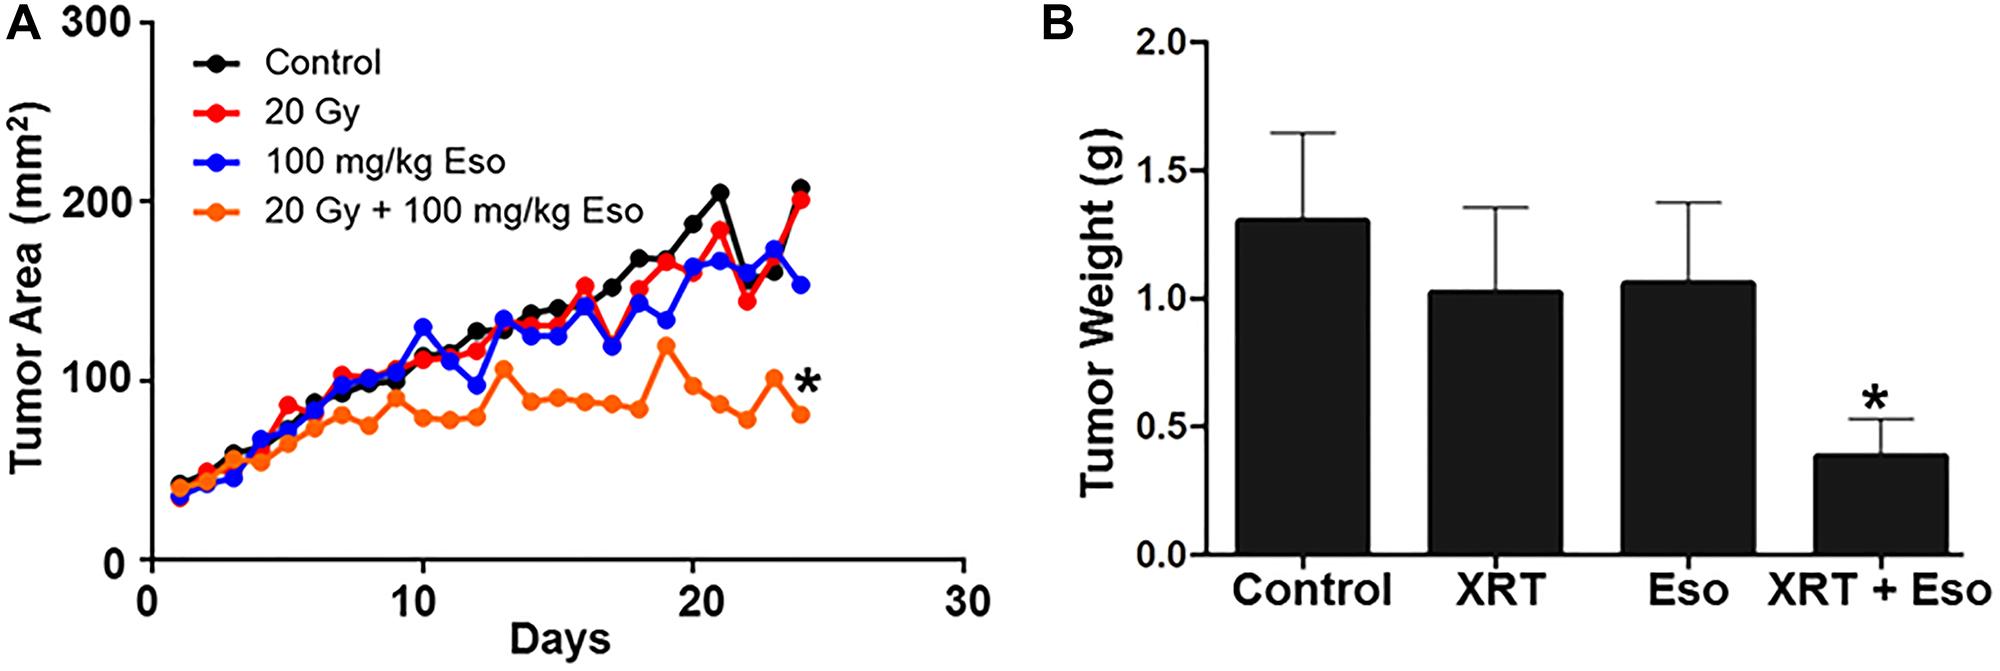 Esomeprazole enhances the effect of radiation to improve tumor control in vivo.